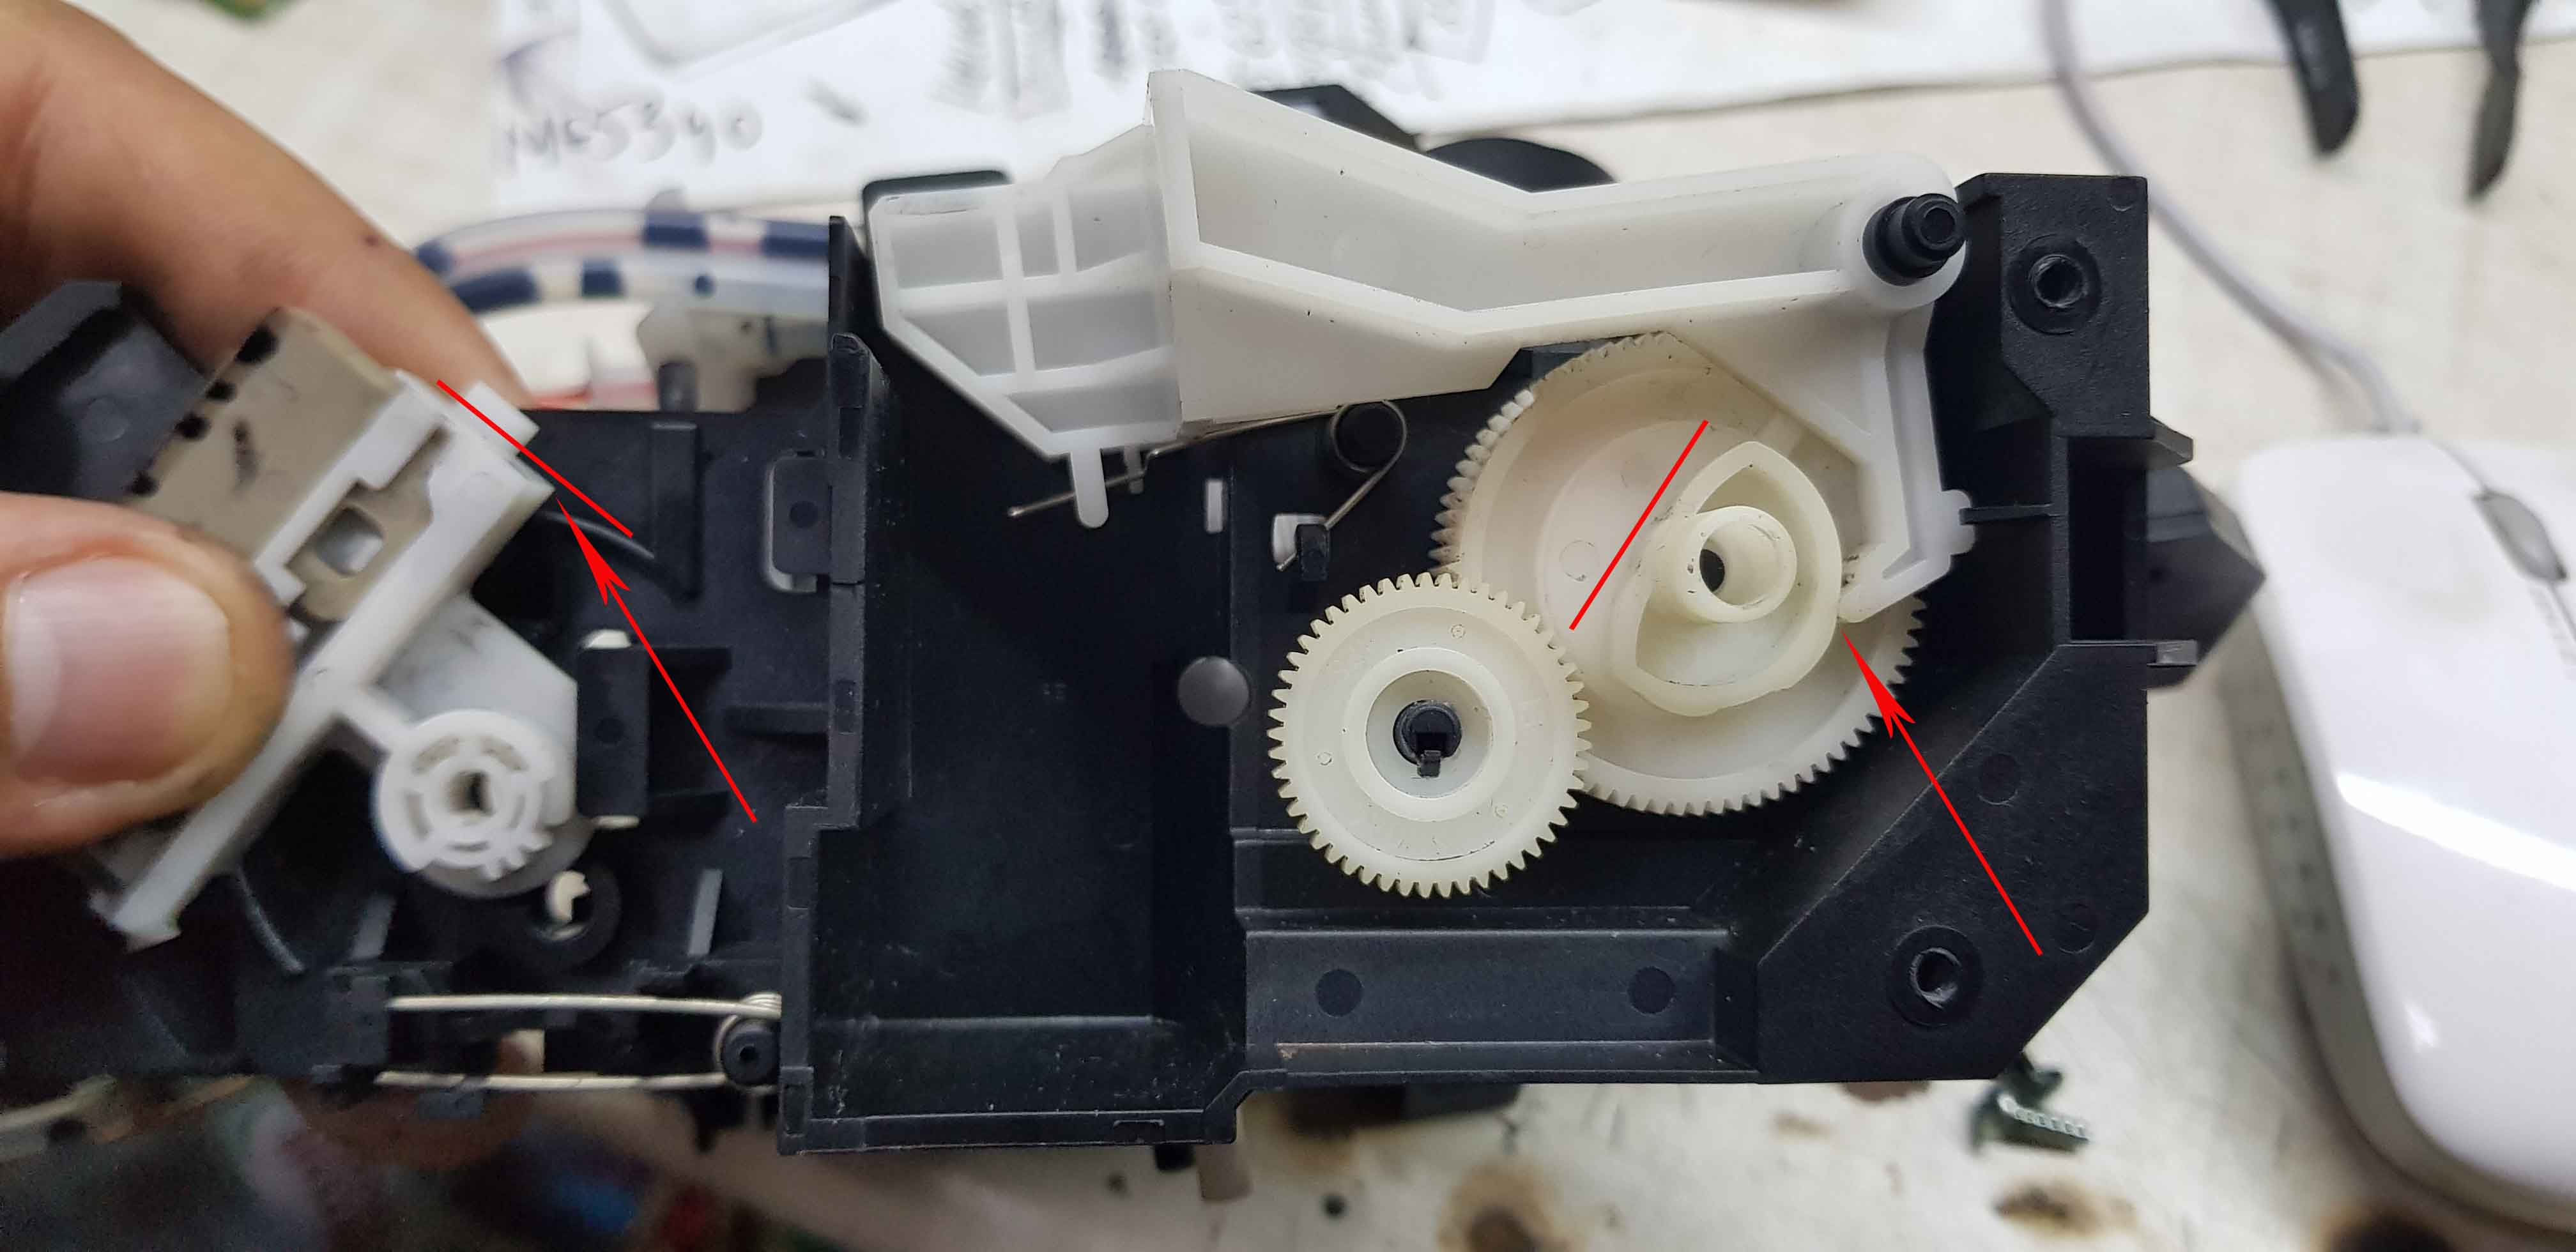 Как собрать помпу на принтере Epson 1410, L1800, L1300, T1100, R2400, R1900 и др.